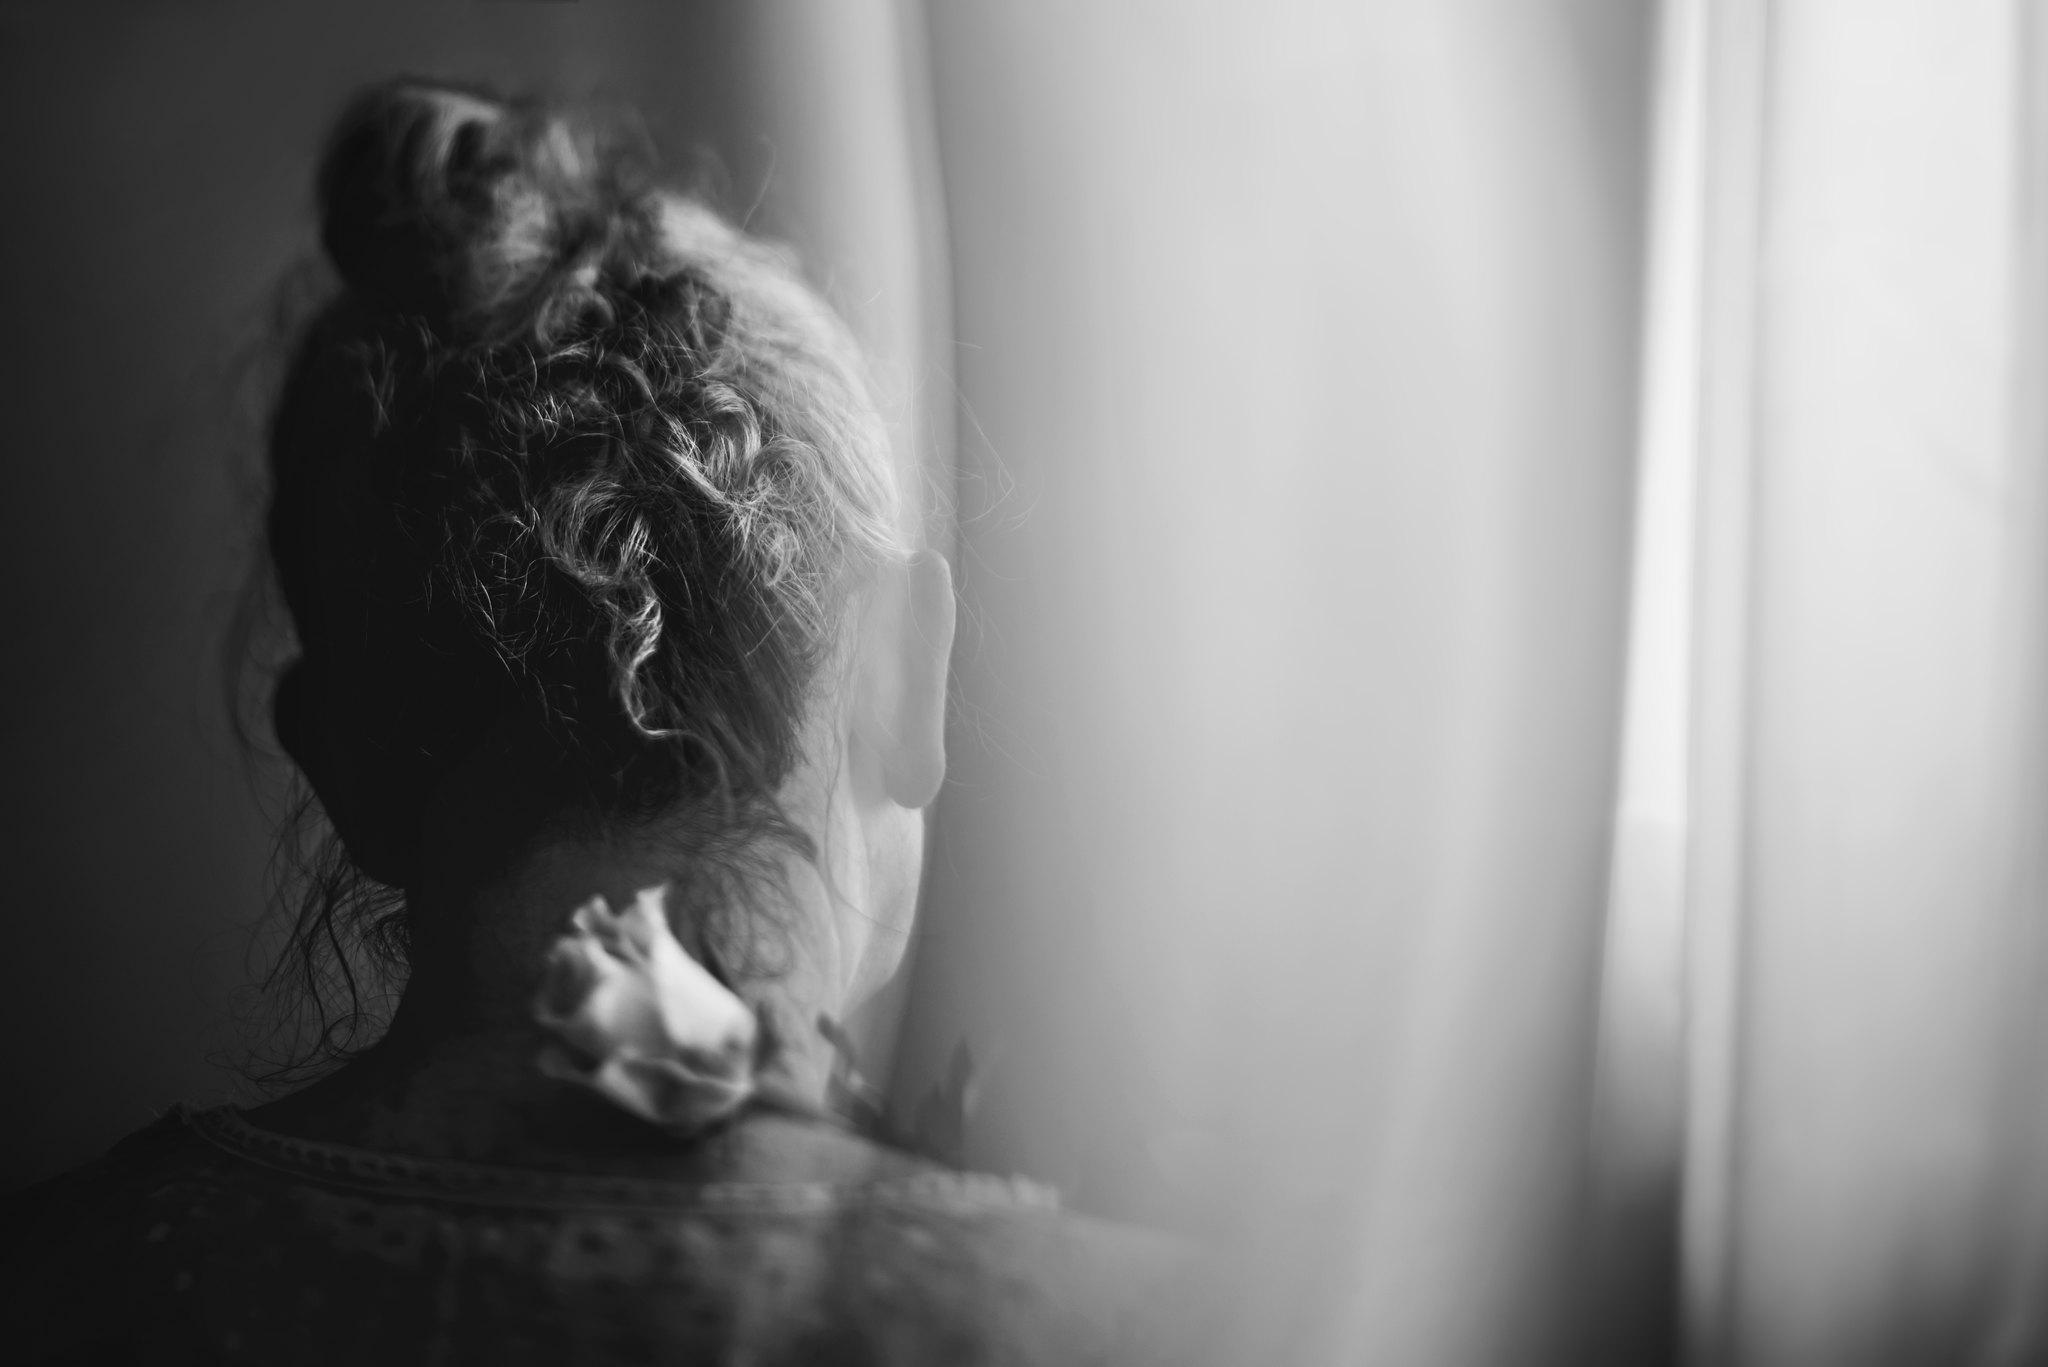 Self portrait with flower 2 by Brisbane photographer Katy Bindels